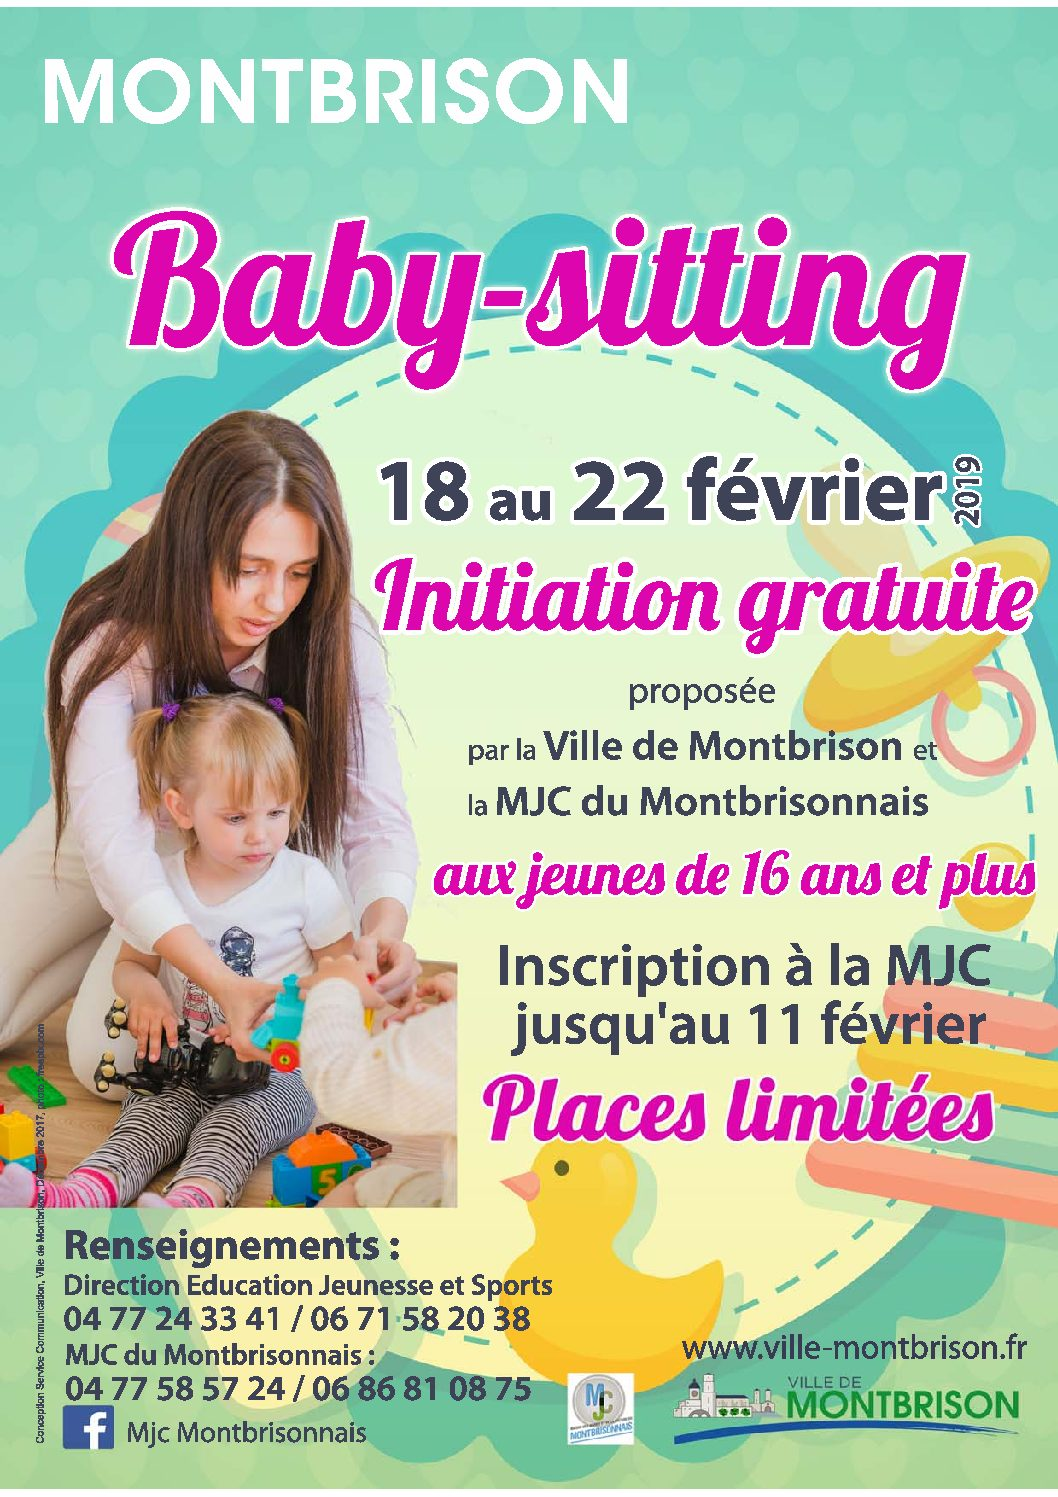 Baby-sitting